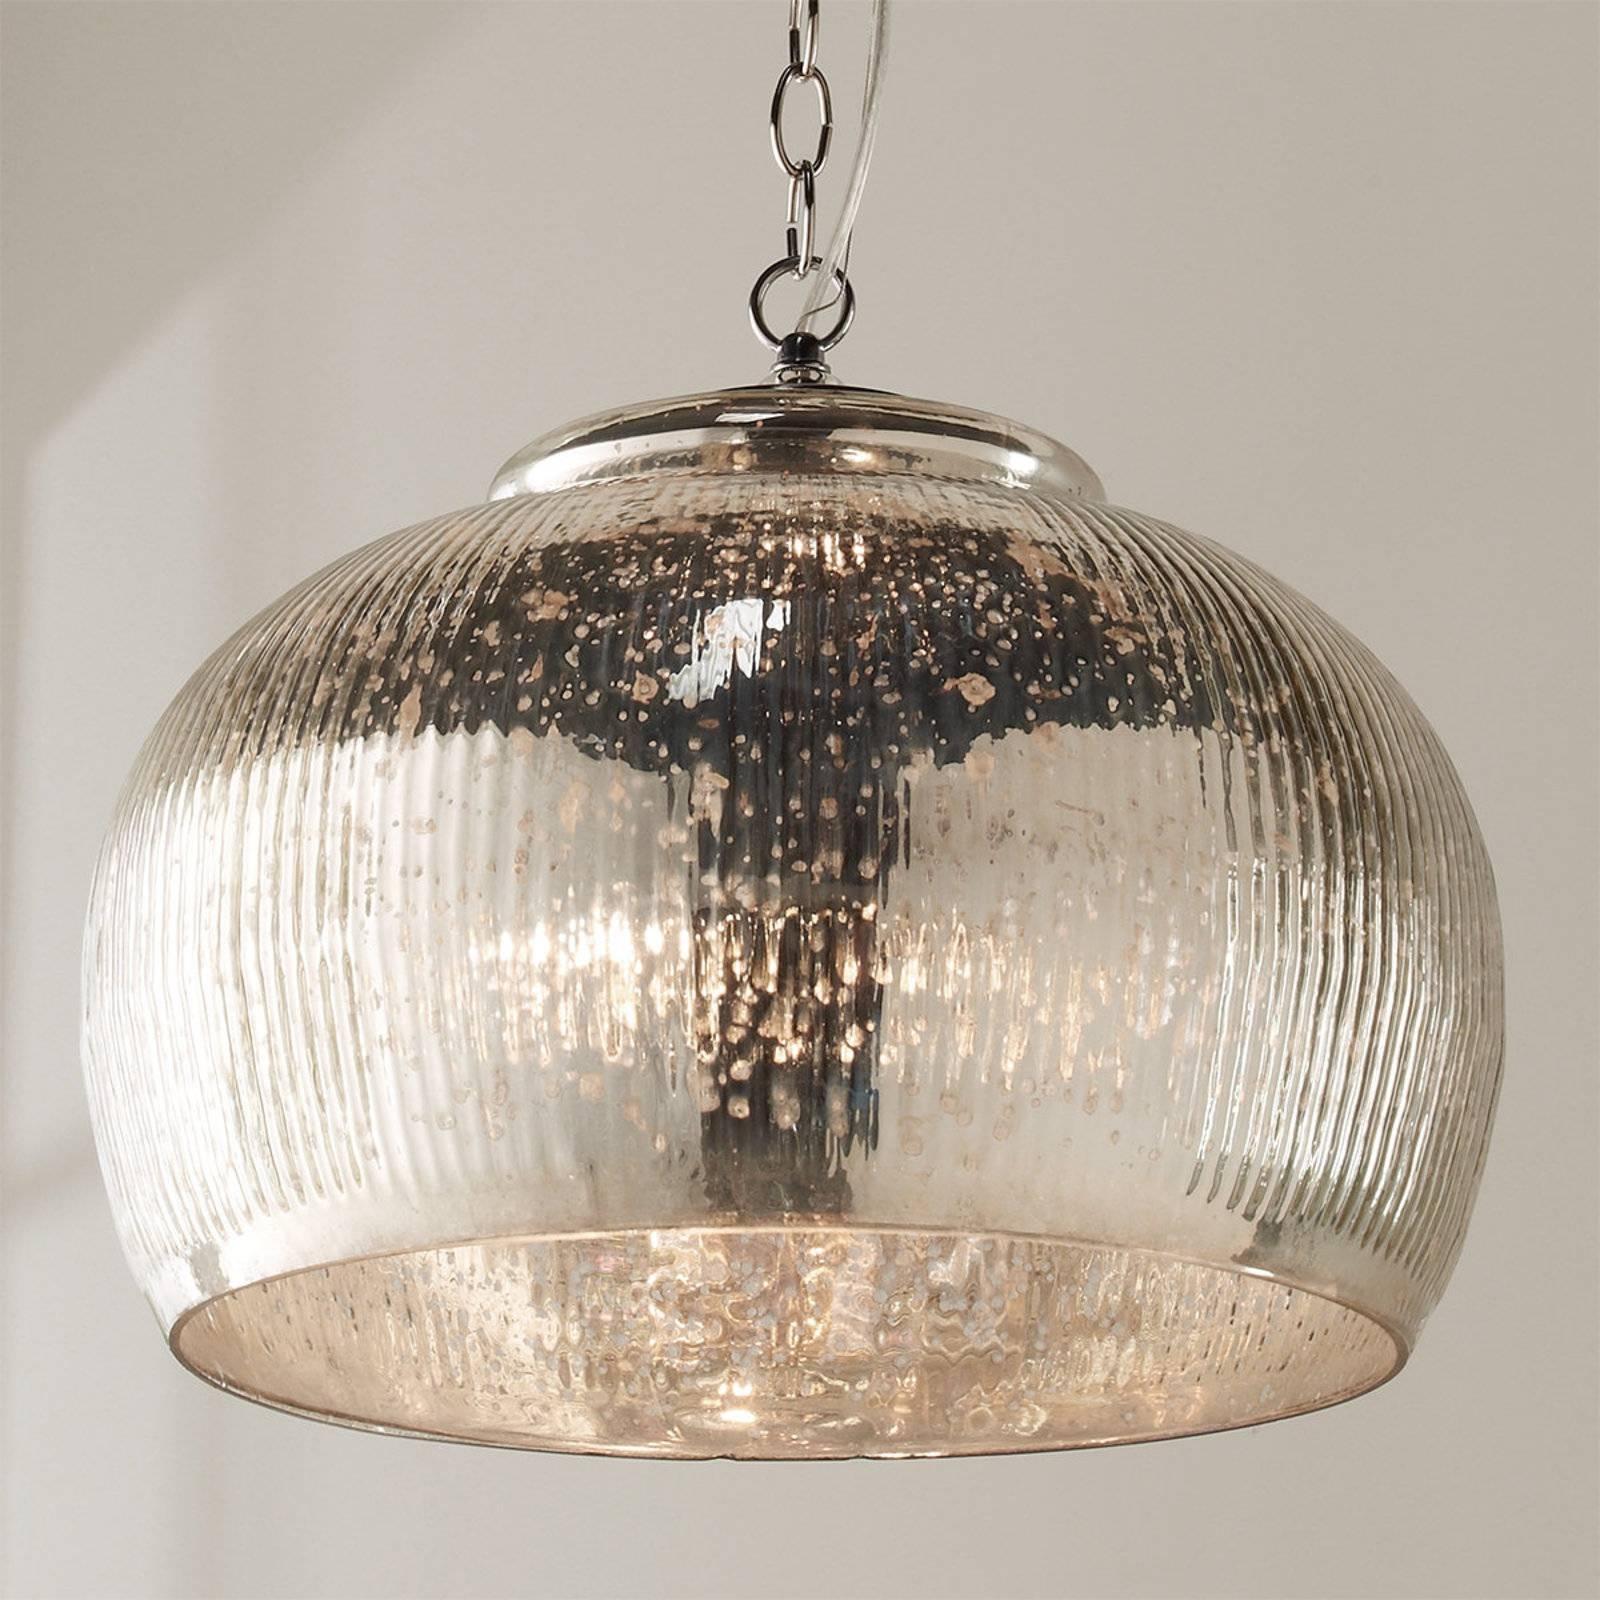 Chandelier: Endearing Mercury Glass Chandelier | Stunning Mercury for Mercury Glass Lights Fixtures (Image 2 of 15)